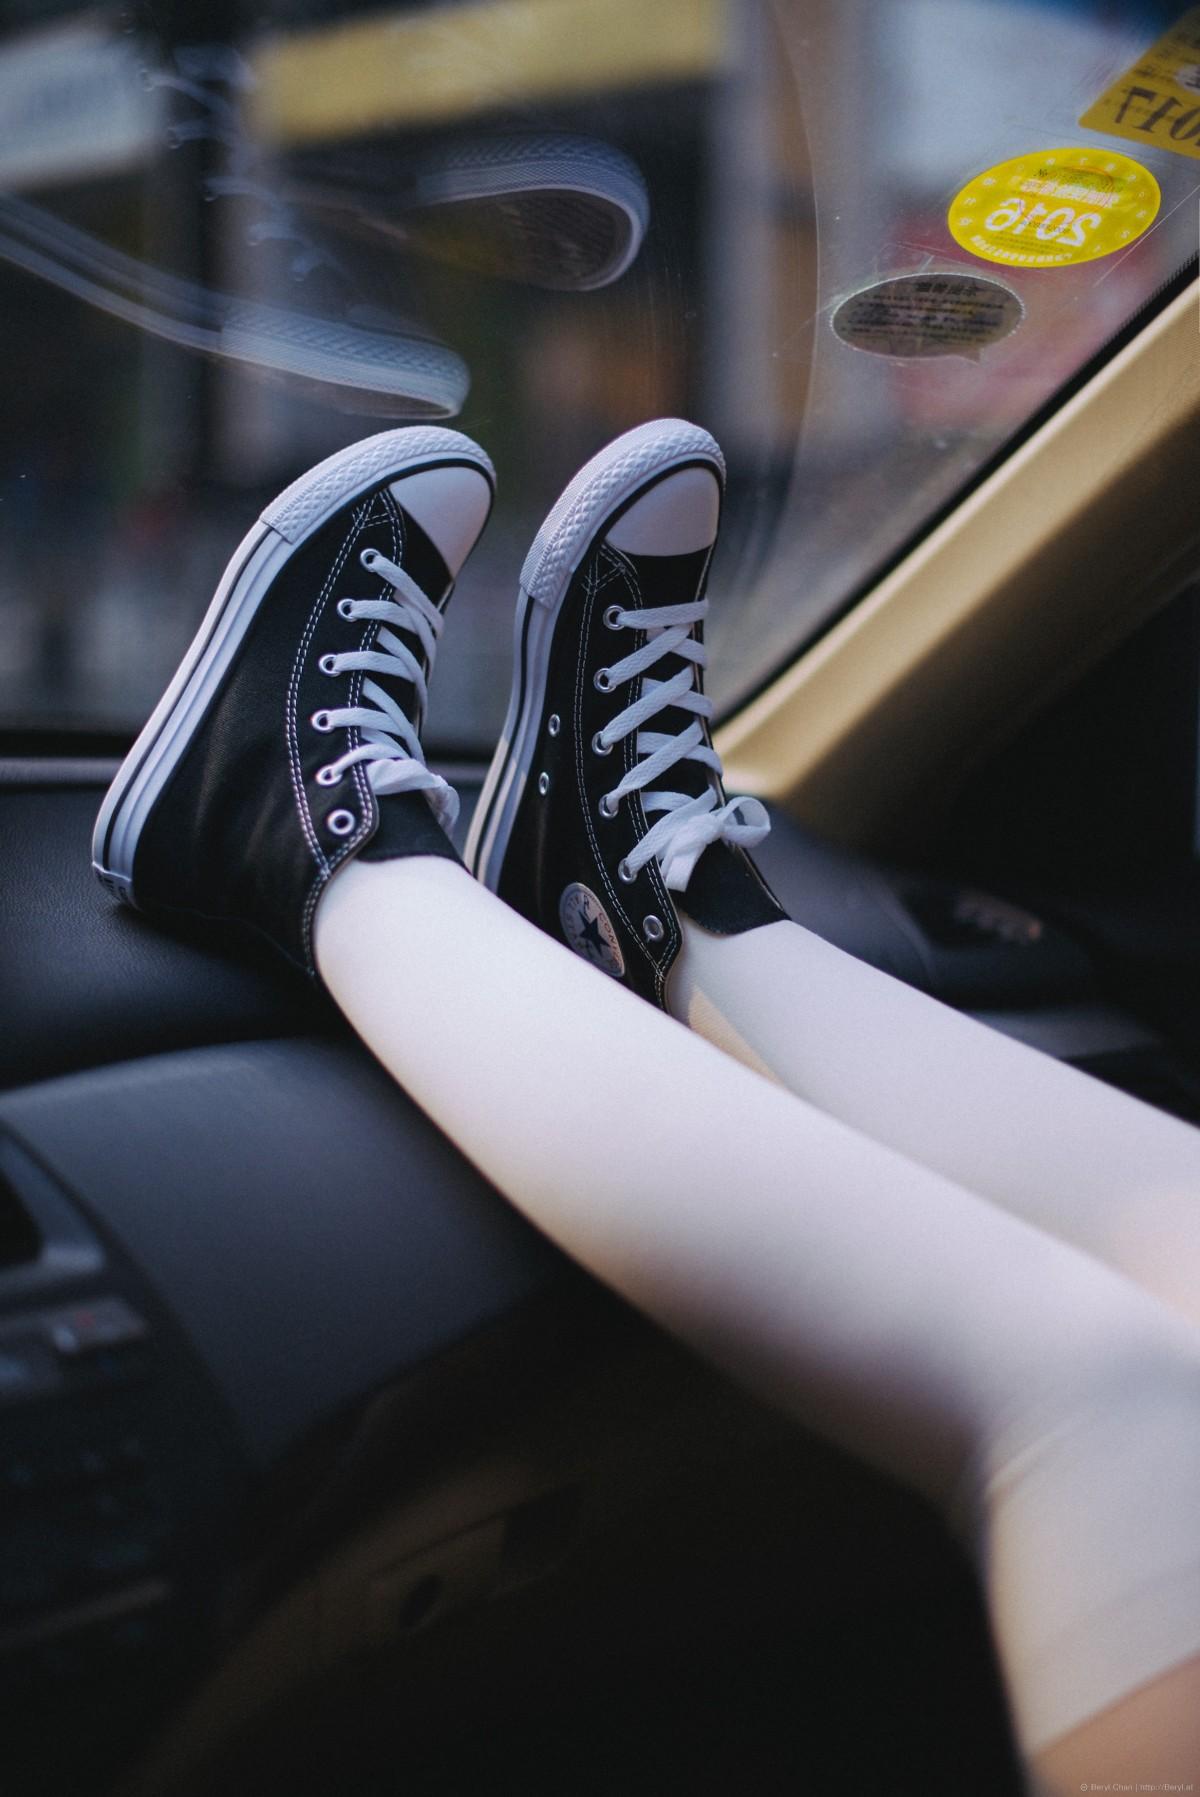 Free Images  Hand, Girl, White, Cute, Leg, Sneaker, Clean -8443